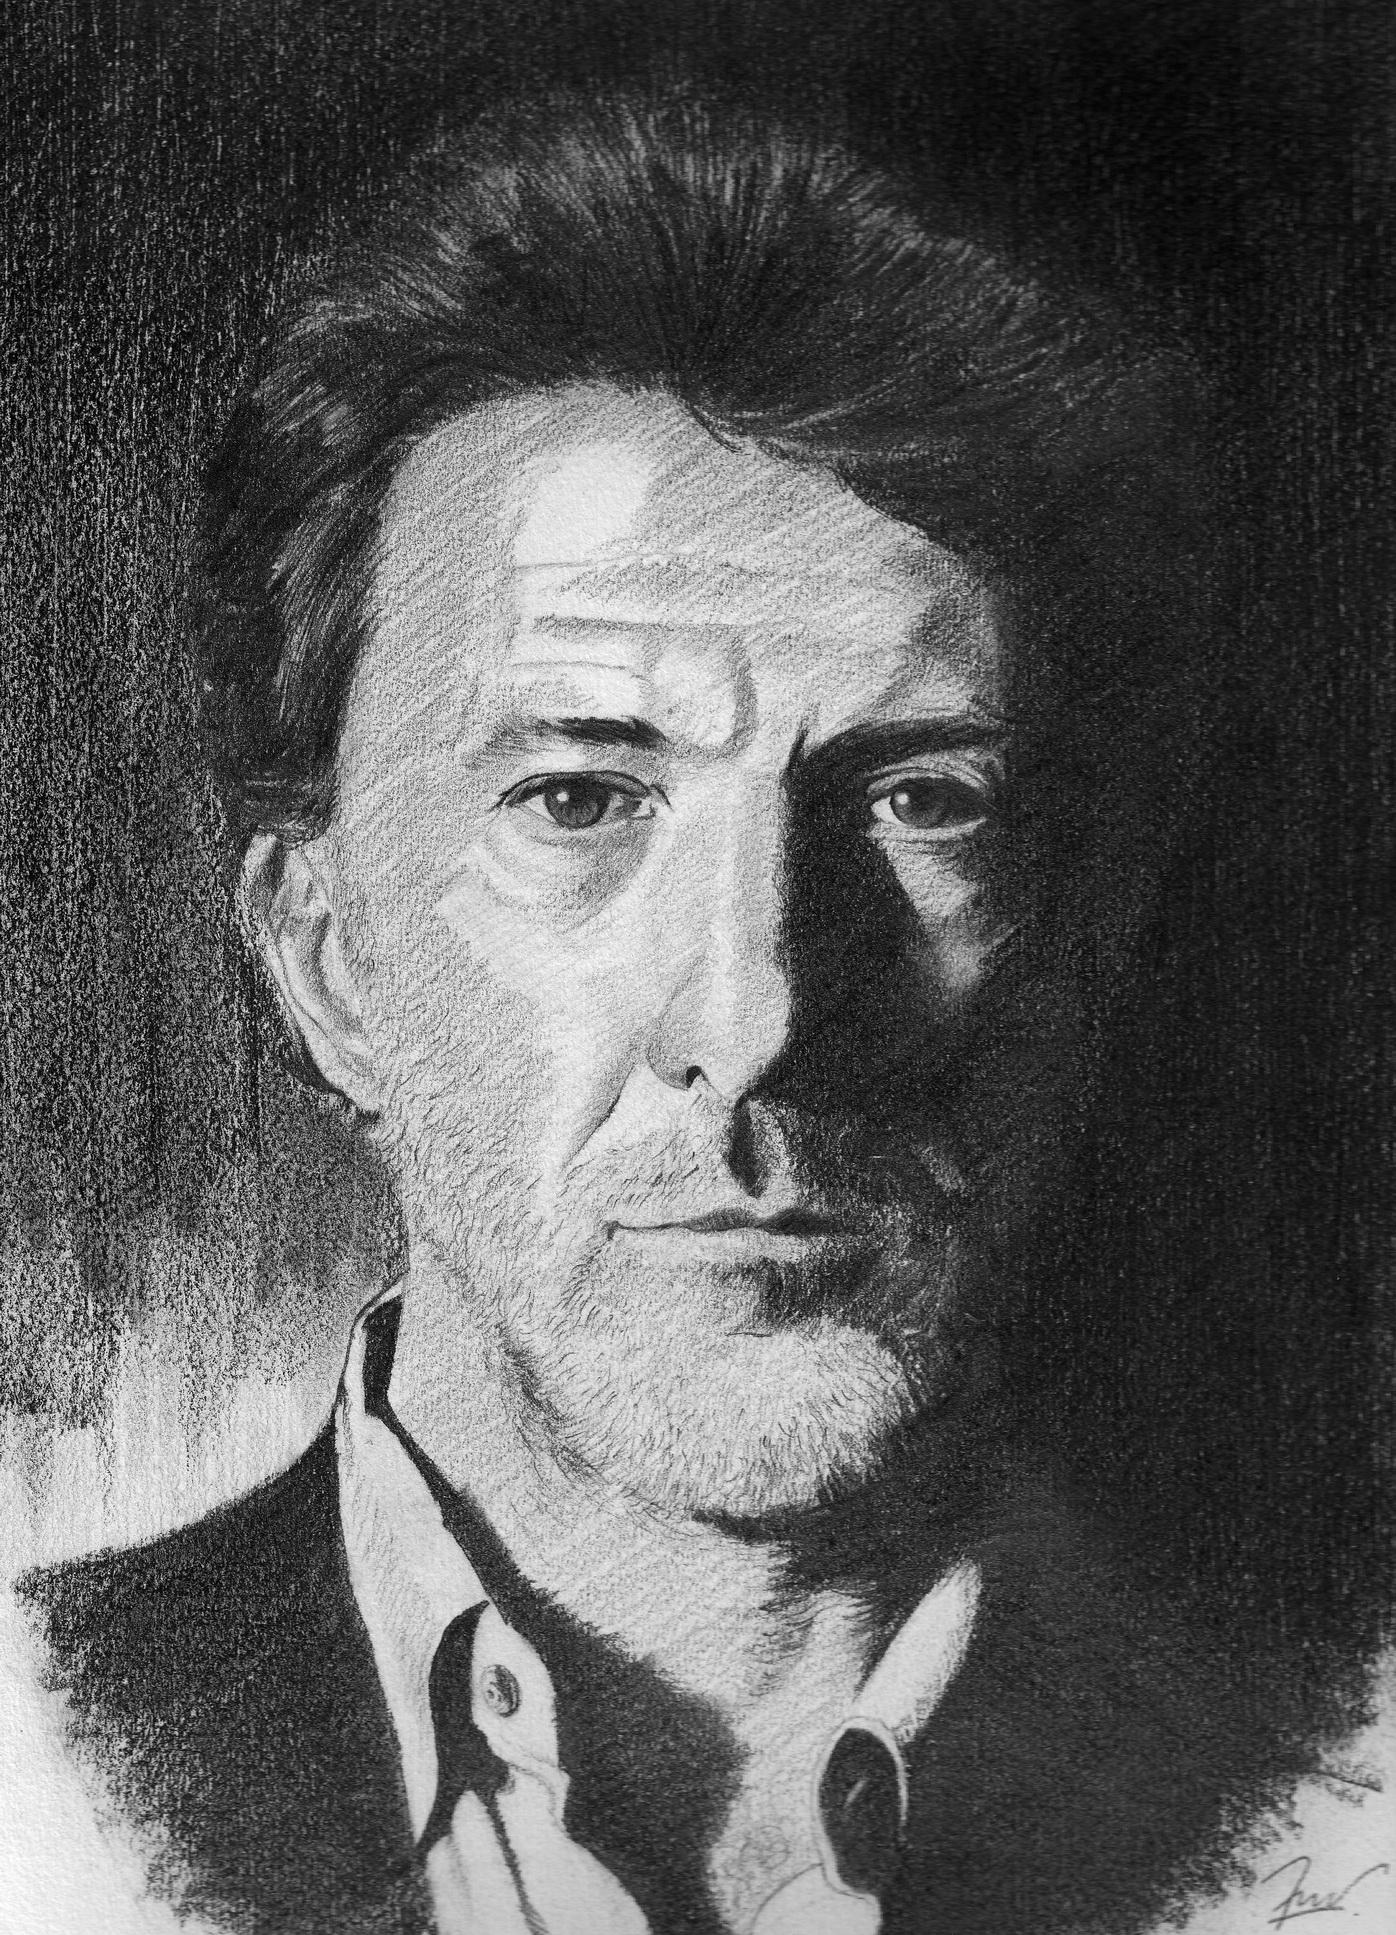 Wallpapers Art - Pencil Portraits Dustin Hoffmann